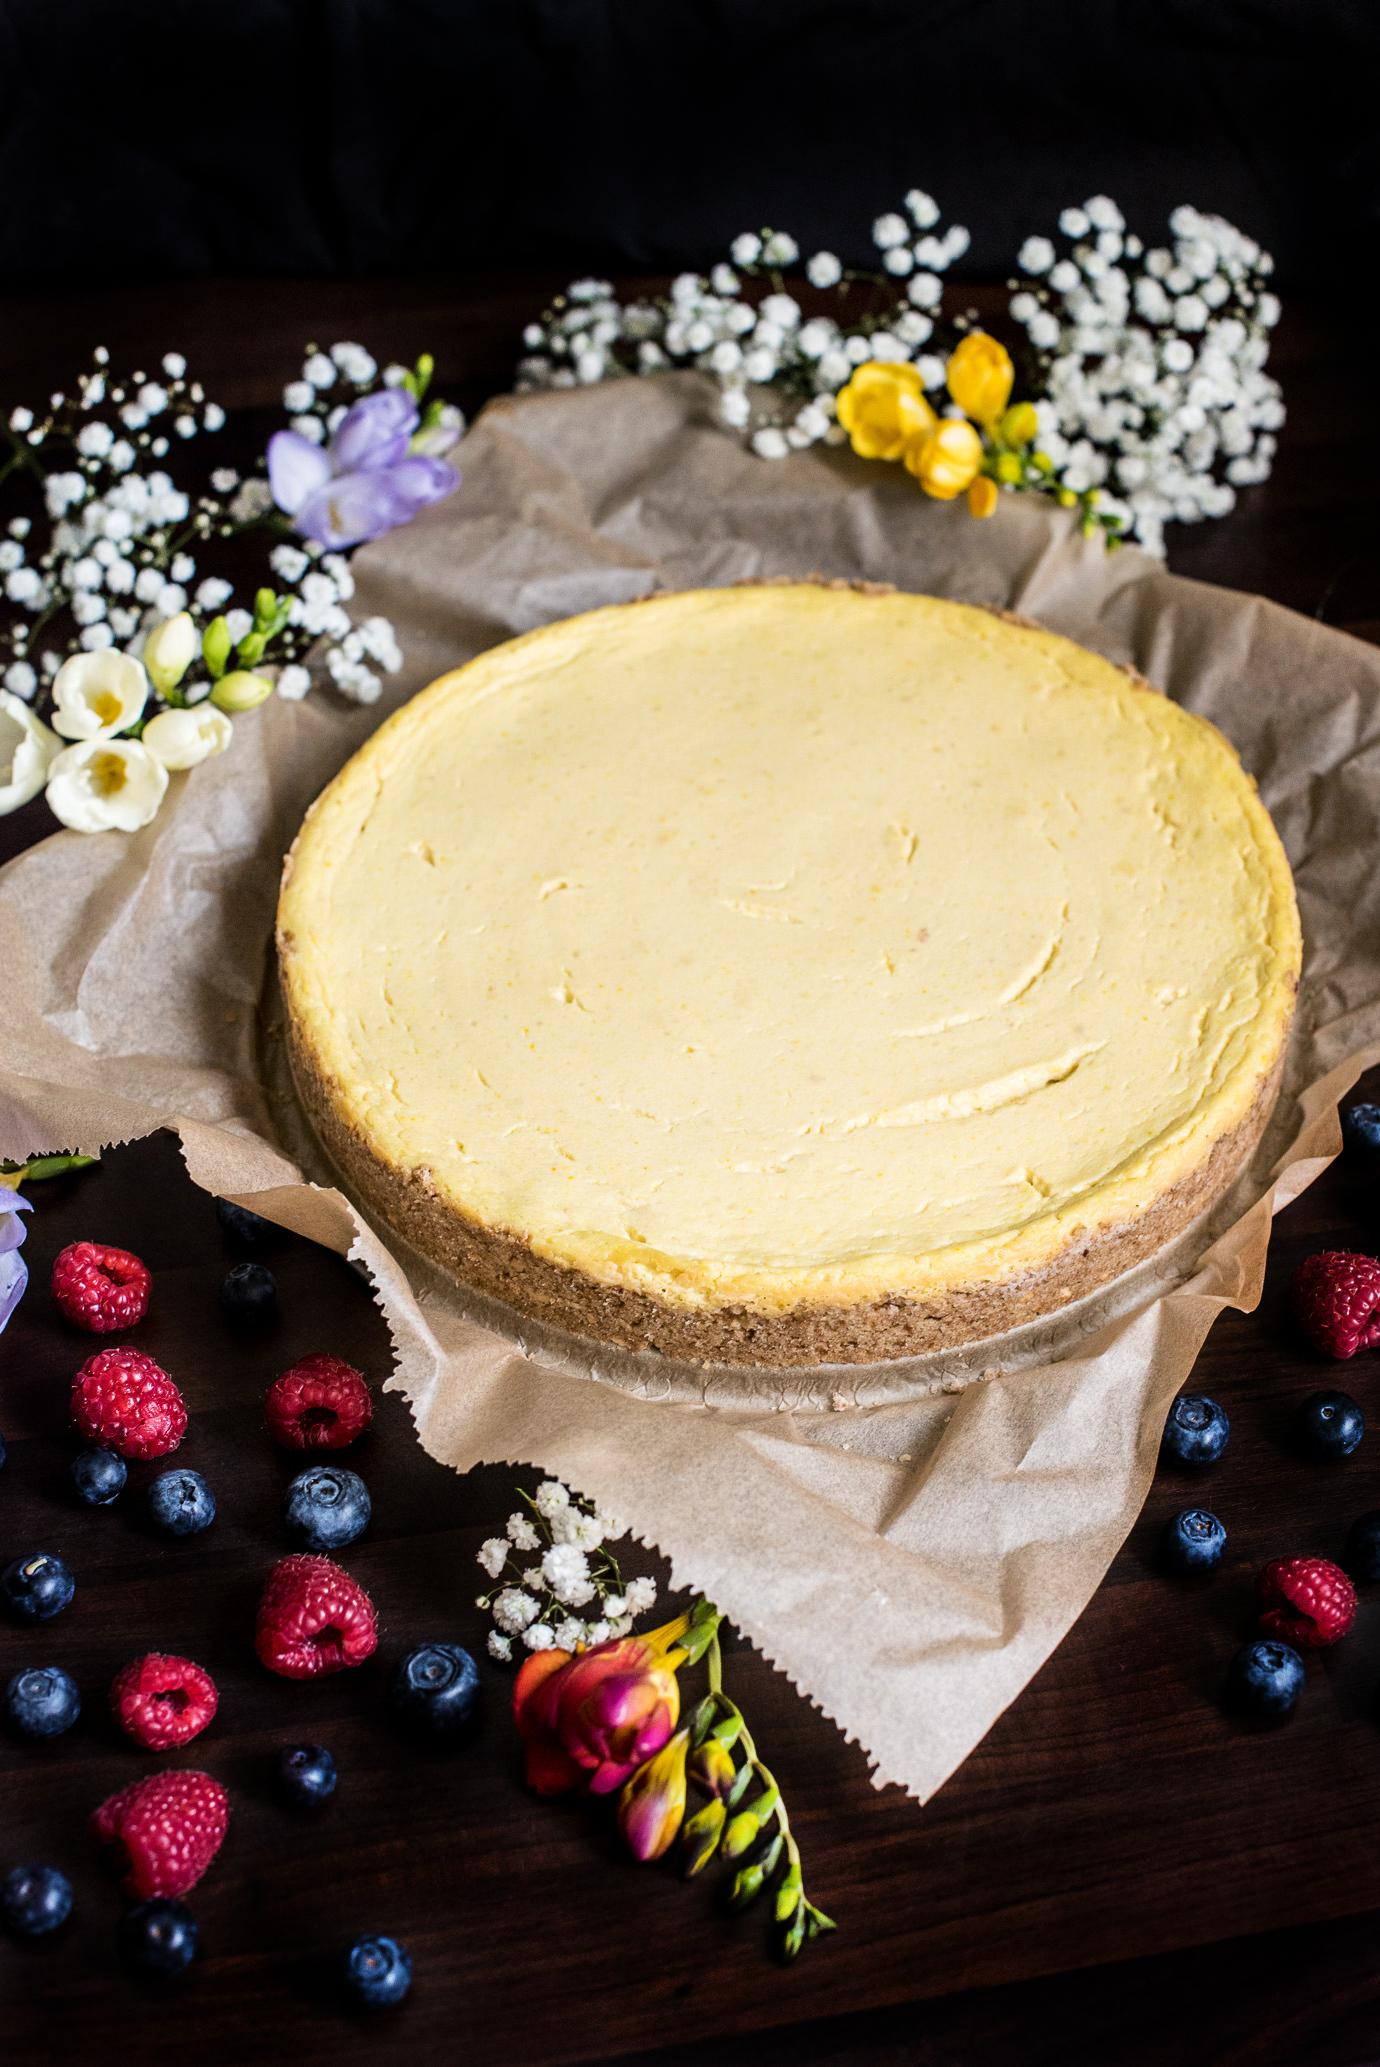 vegan_cheesecake_recipe_veganer_käsekuchen_rezept_4